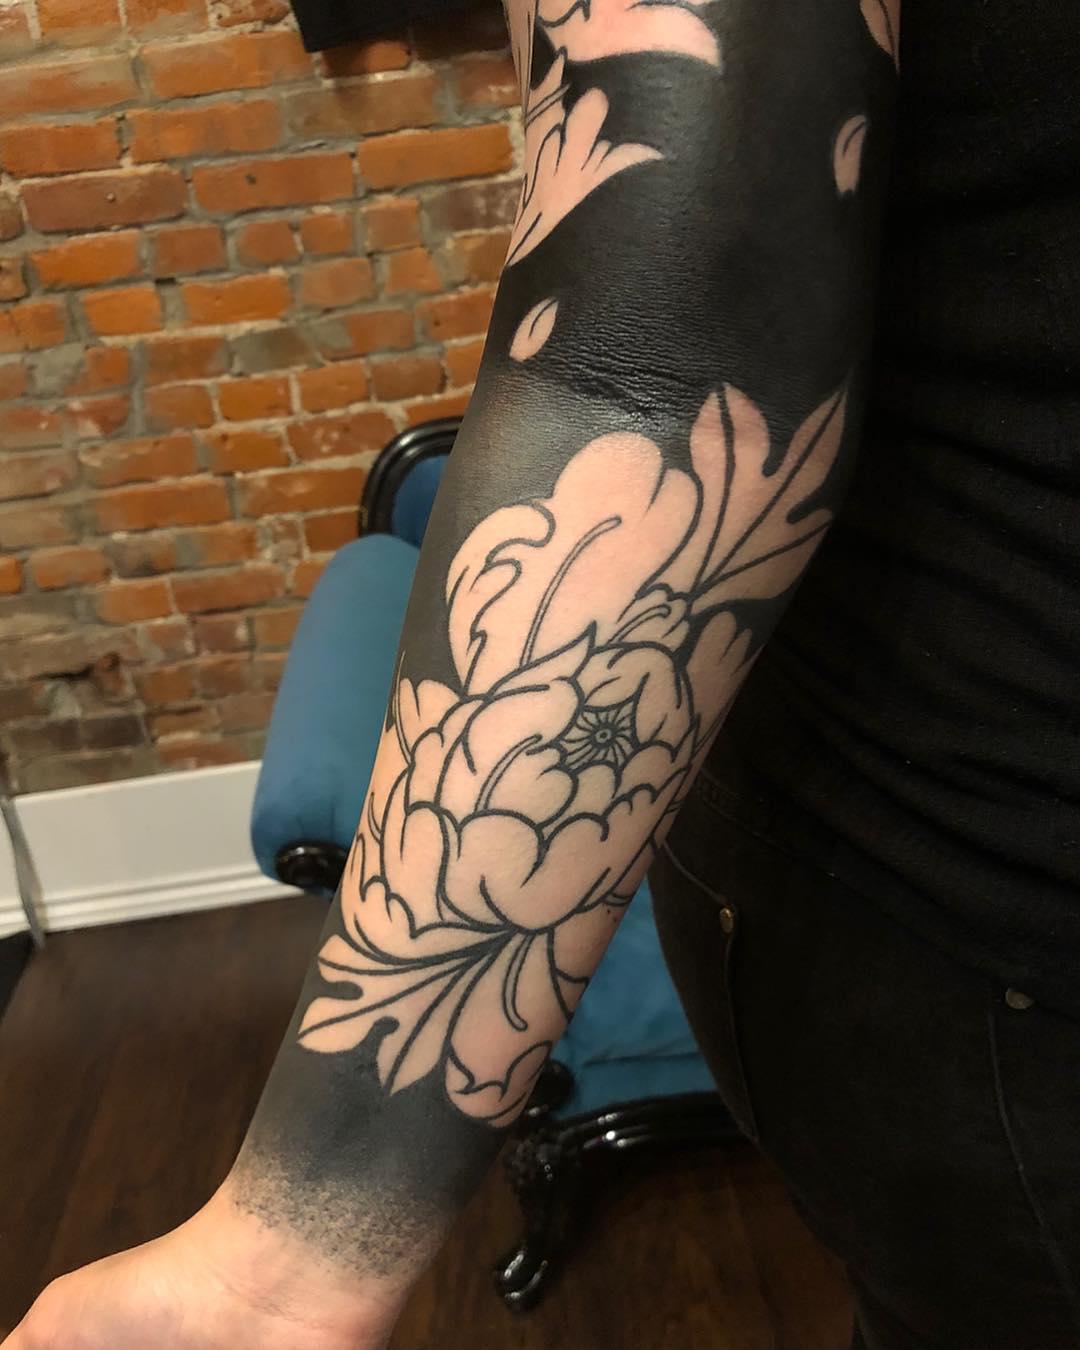 tattoosby_nash_30078002_459803974433949_1792755100658171904_n.jpg